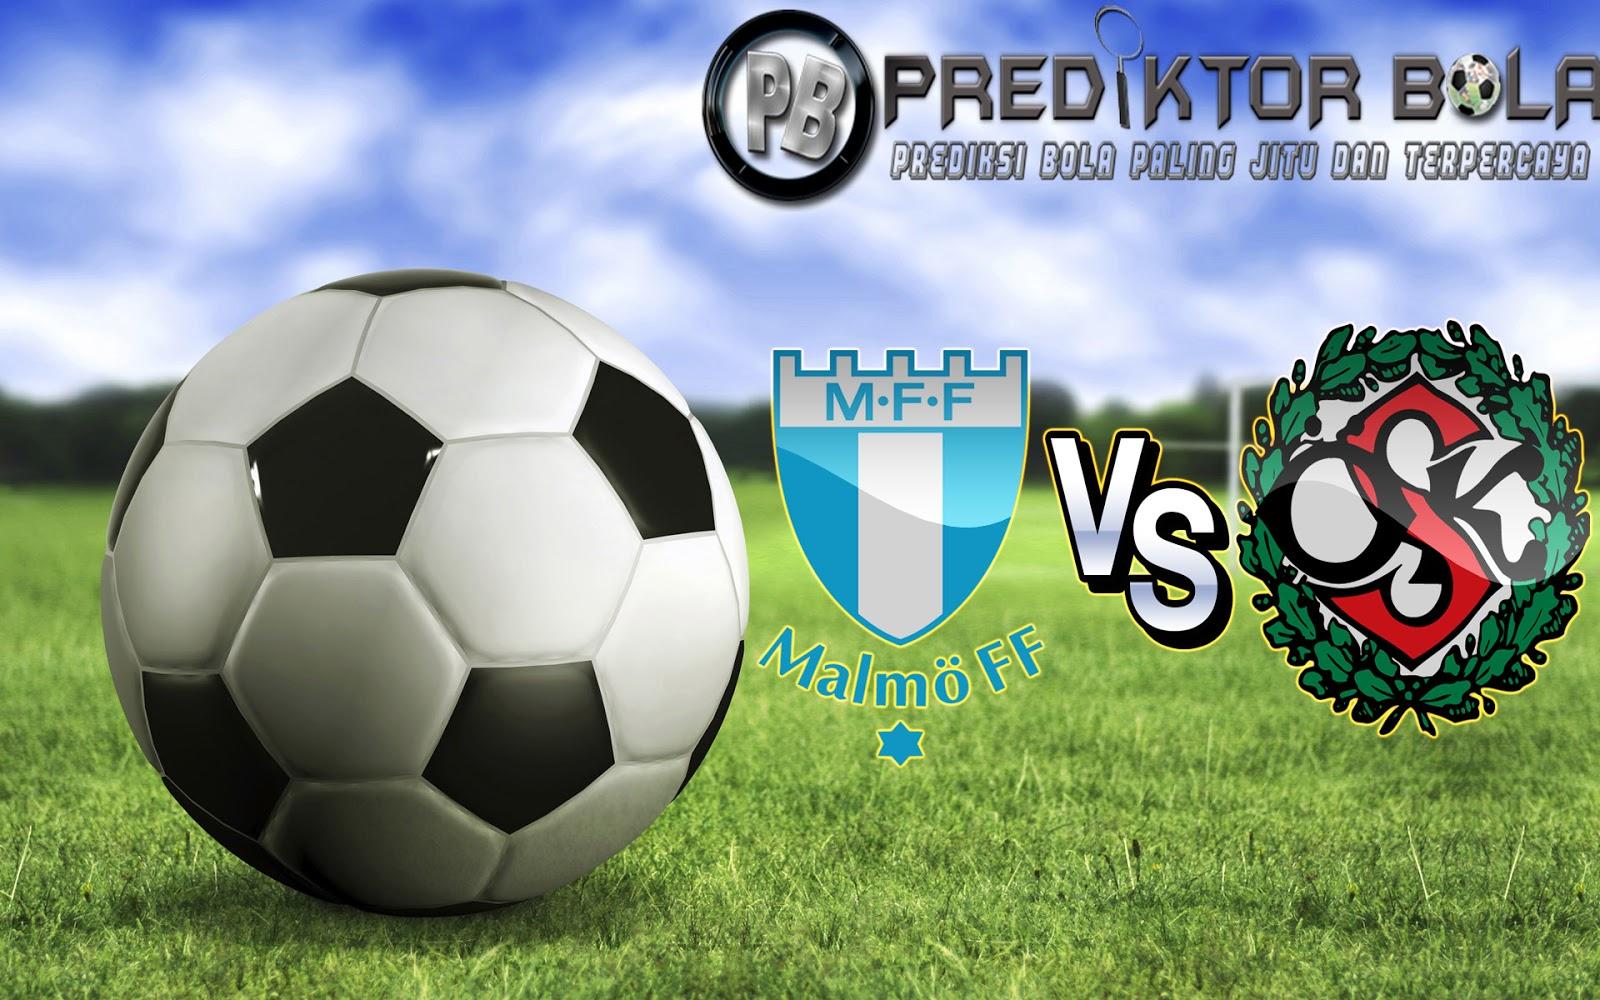 Prediksi Malmo vs Orebro 12 Juli 2016